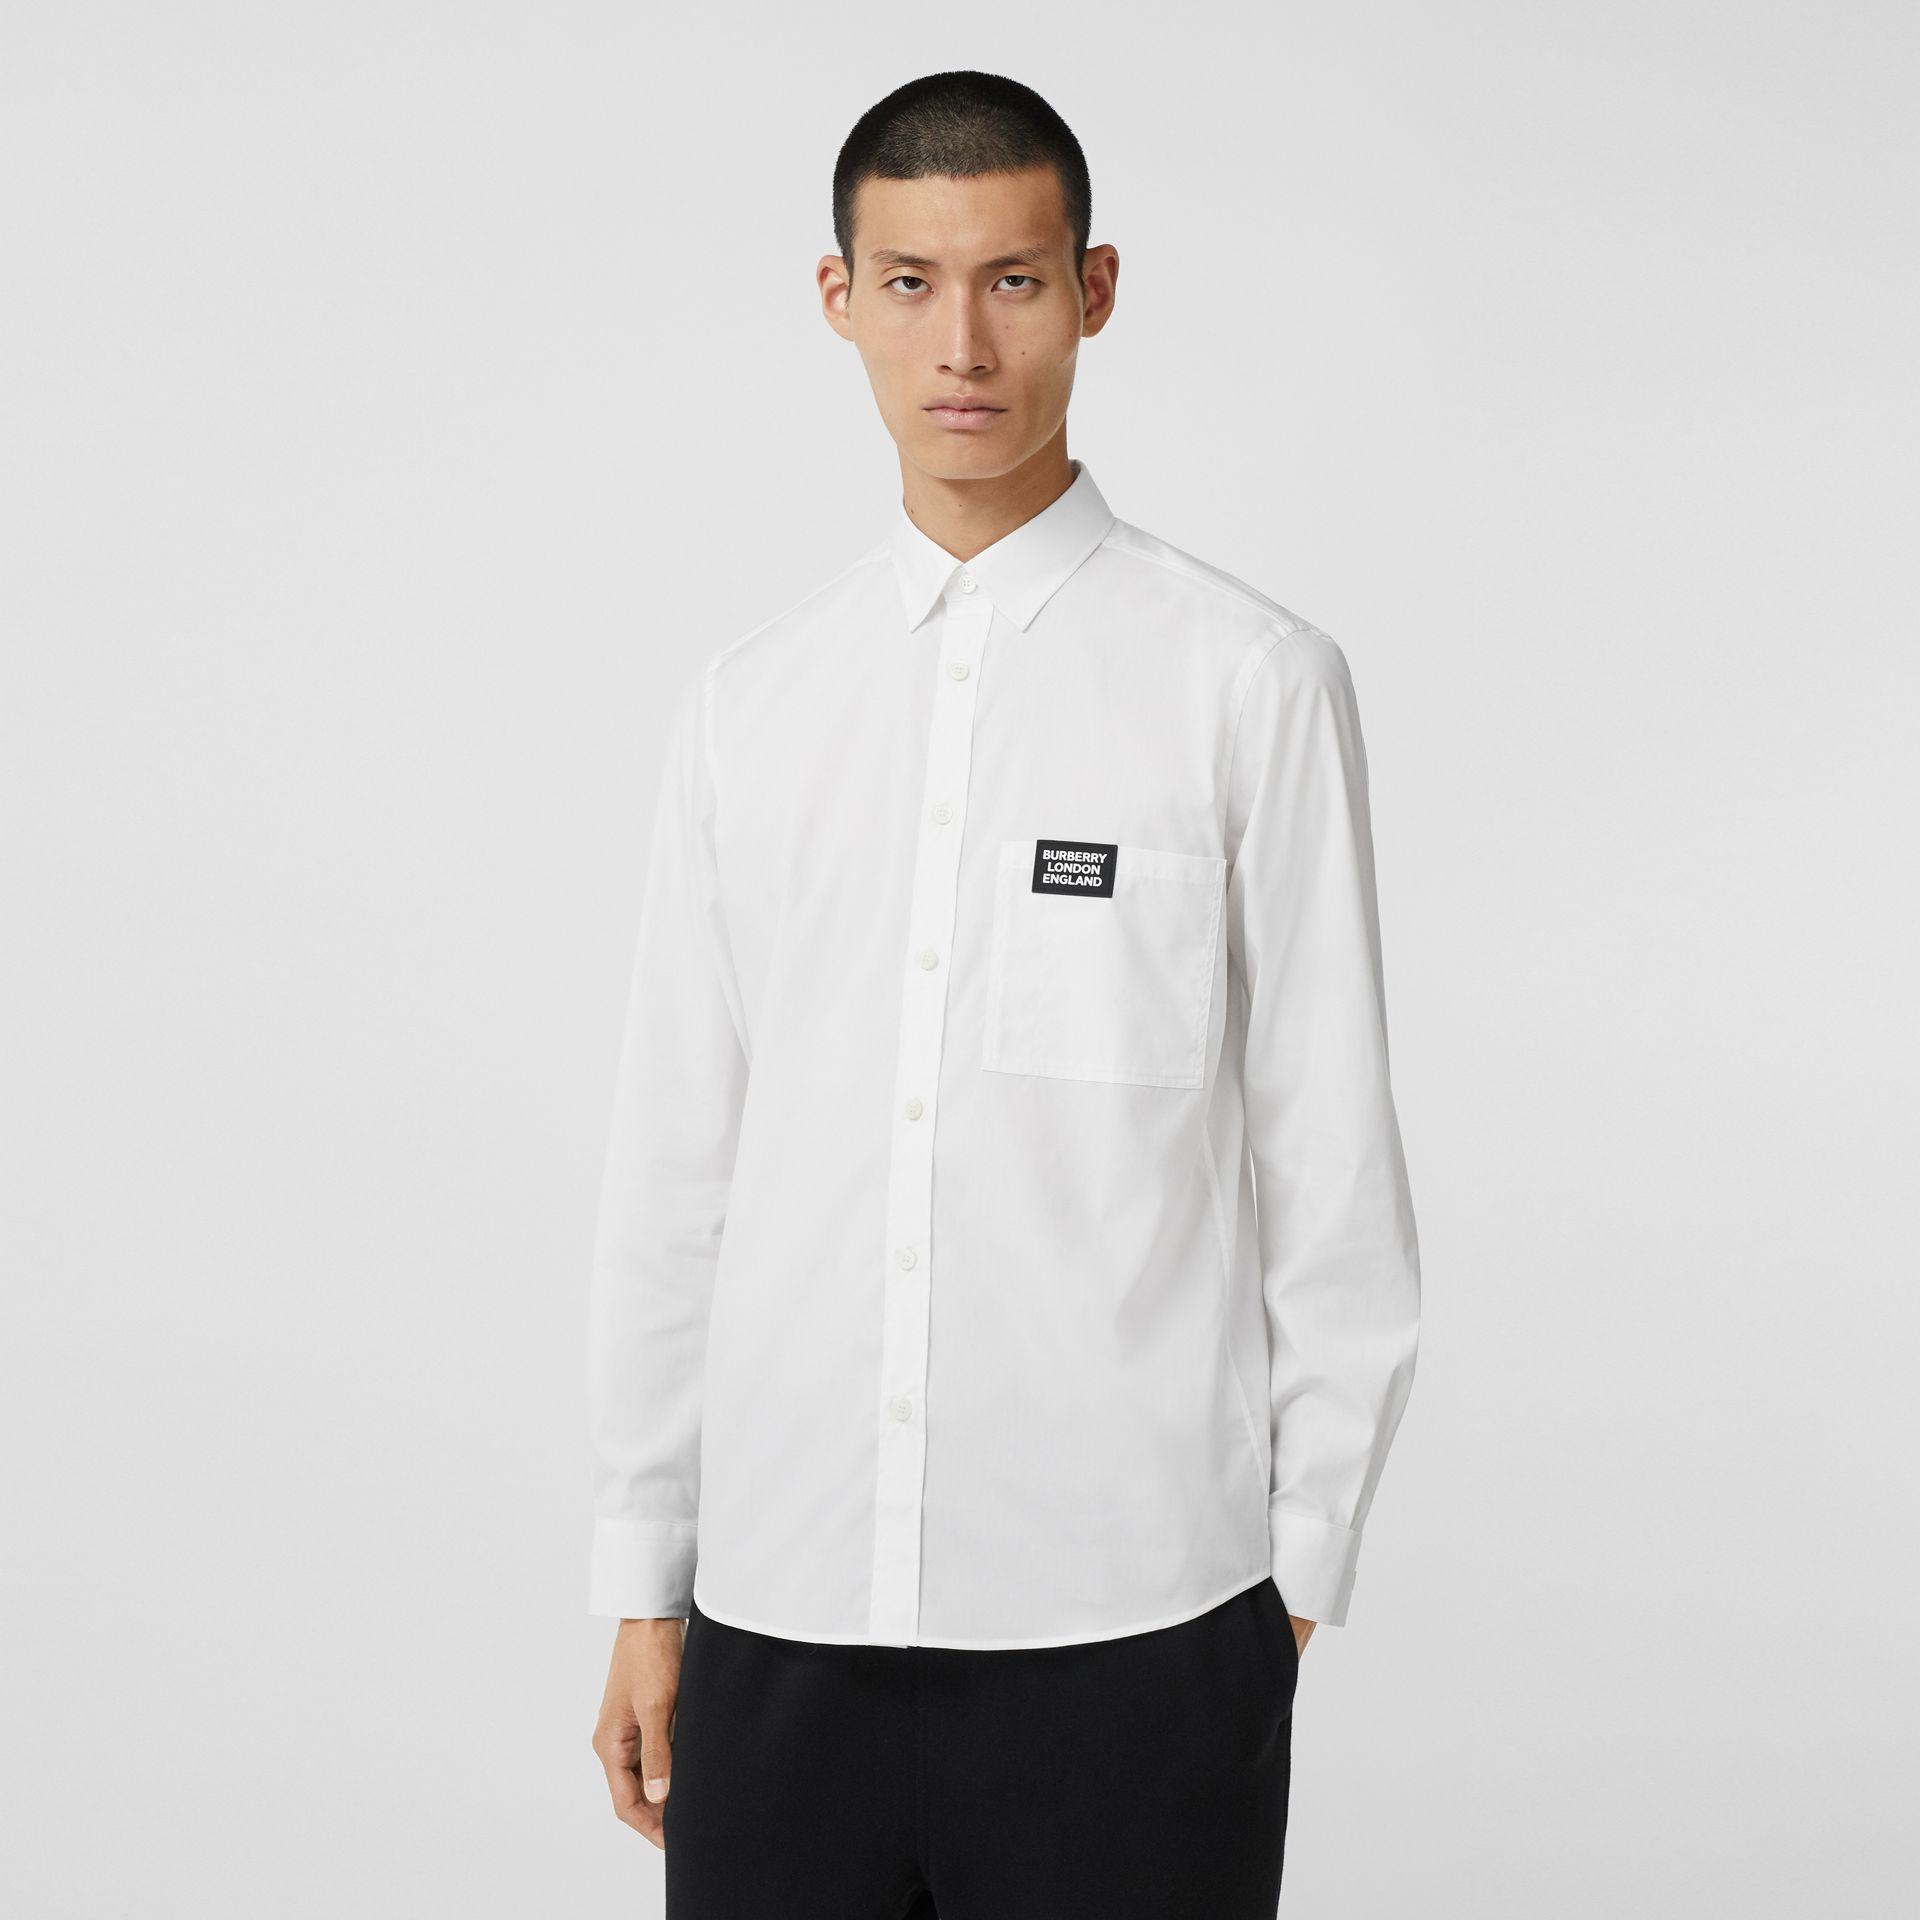 Logo Detail Stretch Cotton Poplin Shirt in White - Men | Burberry United Kingdom - gallery image 0